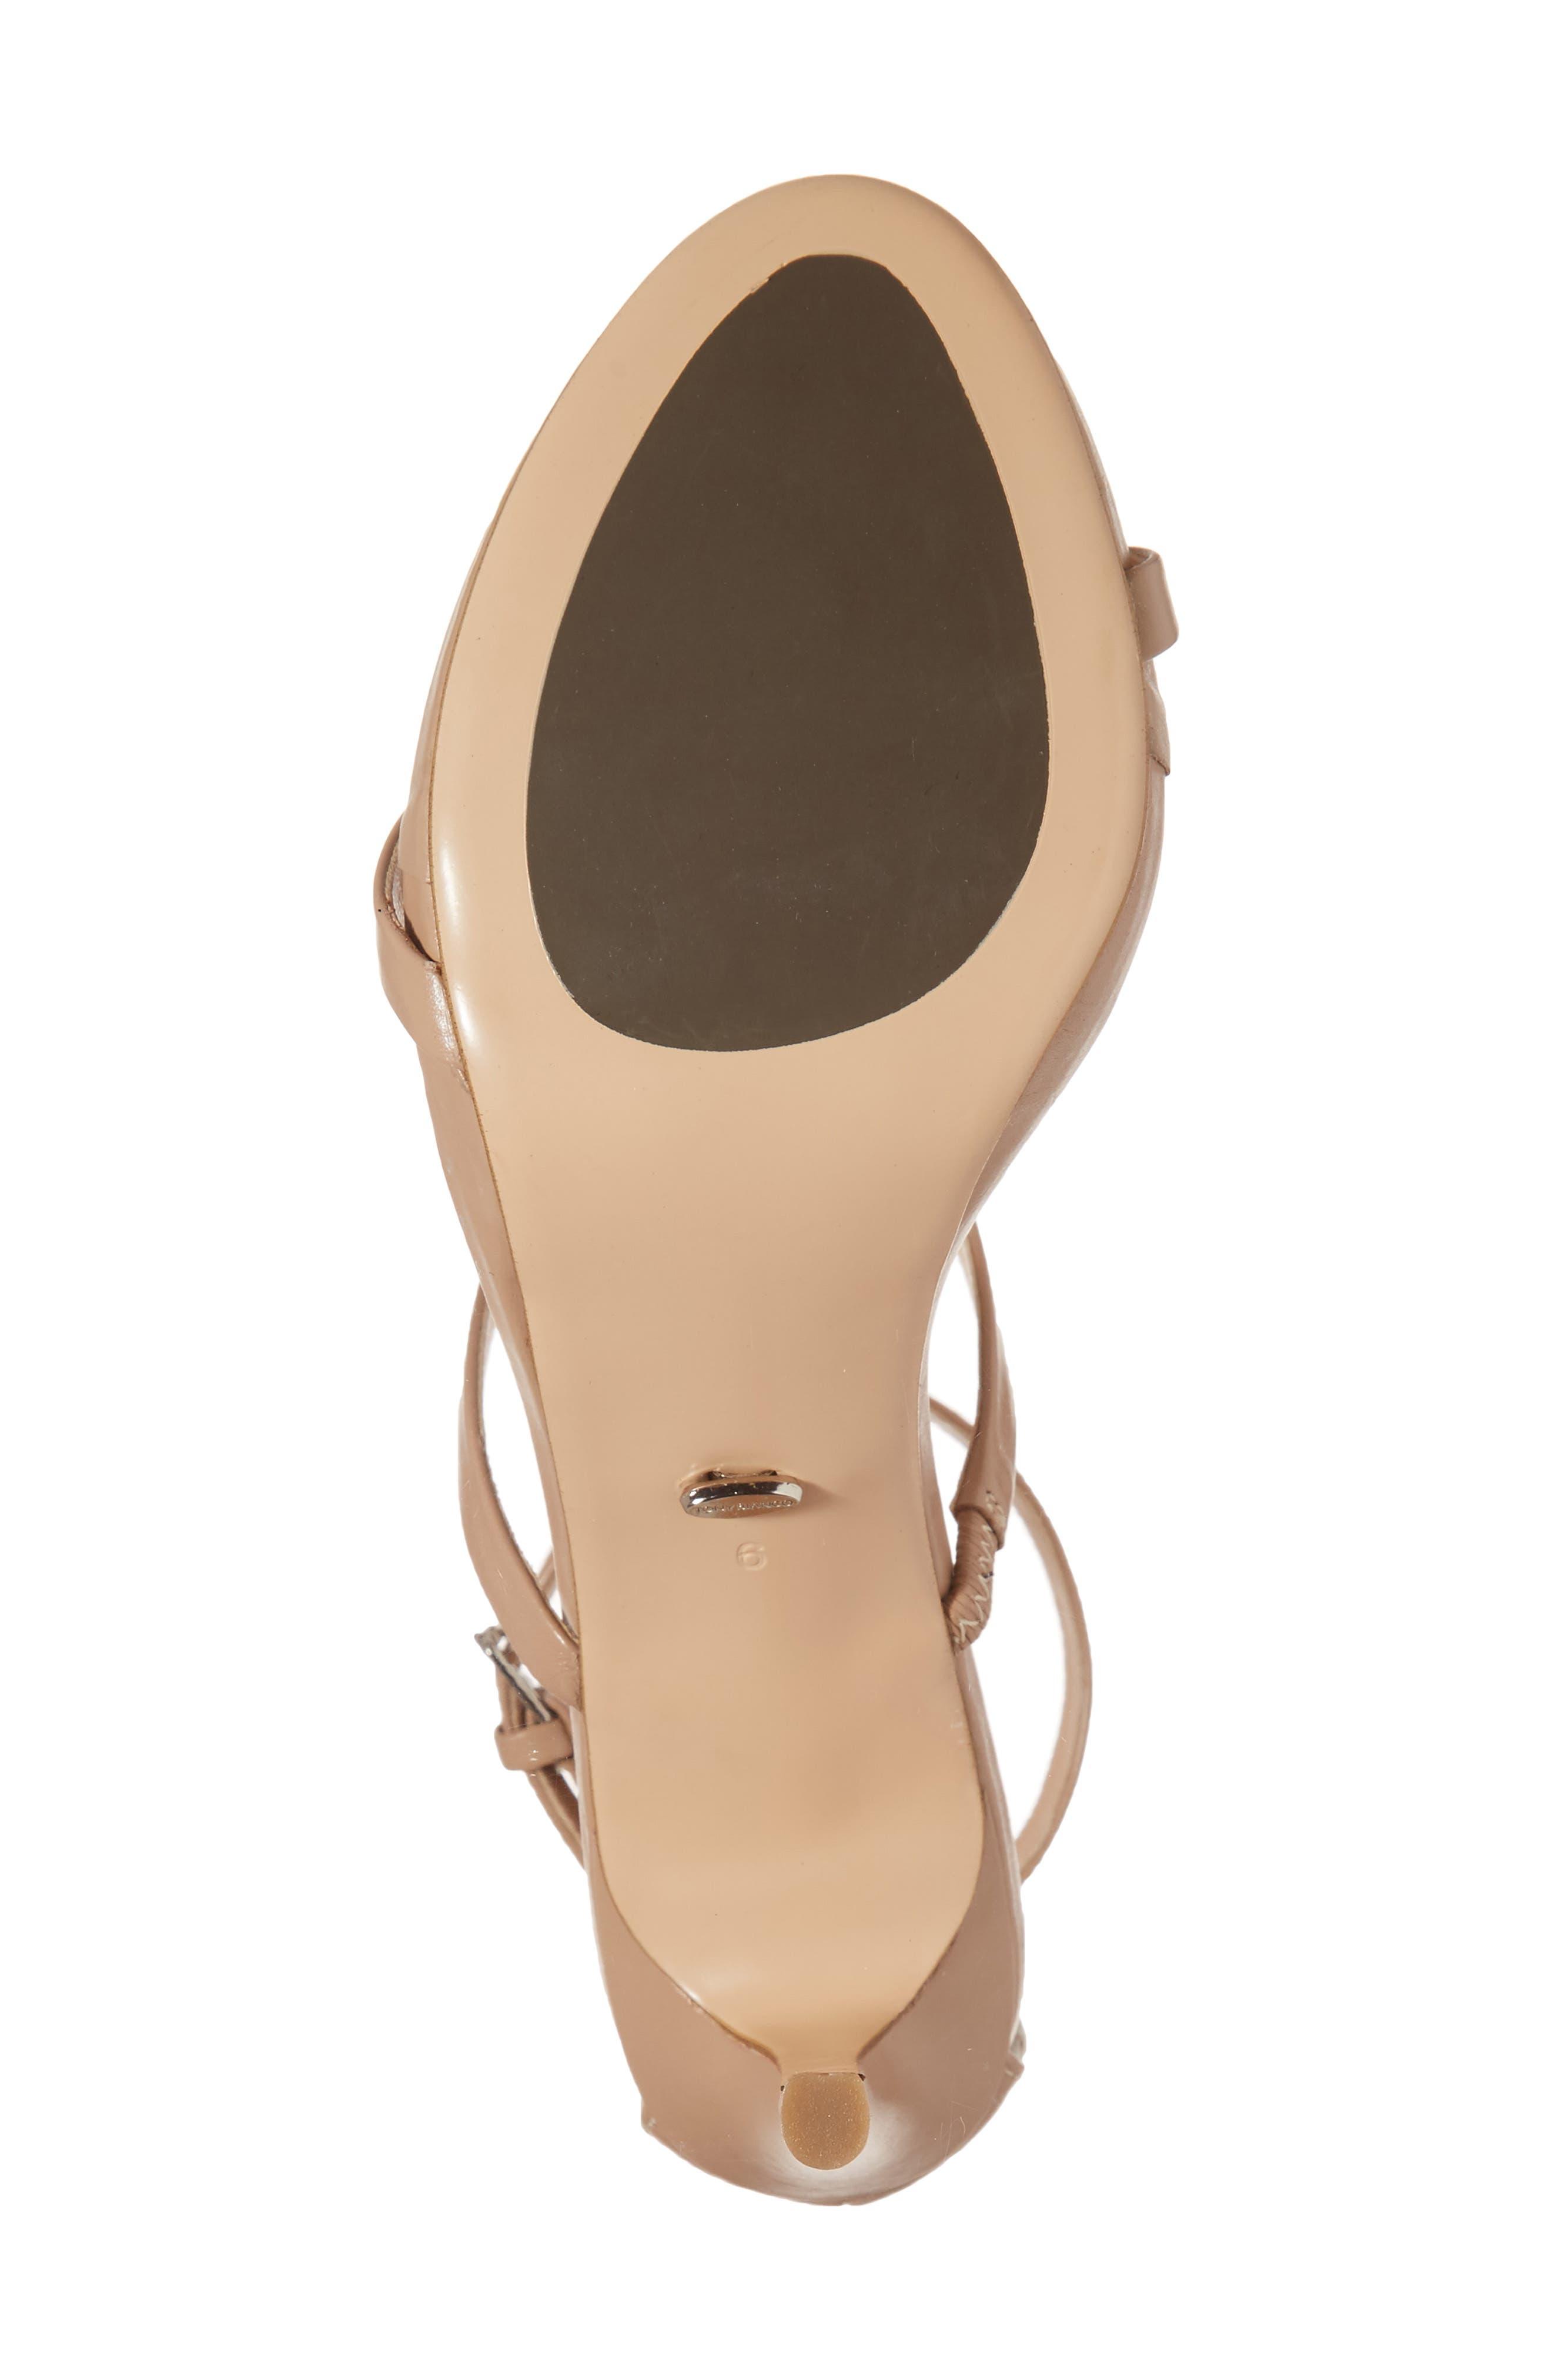 Carey Three-Strap Sandal,                             Alternate thumbnail 6, color,                             Skin Capretto Leather